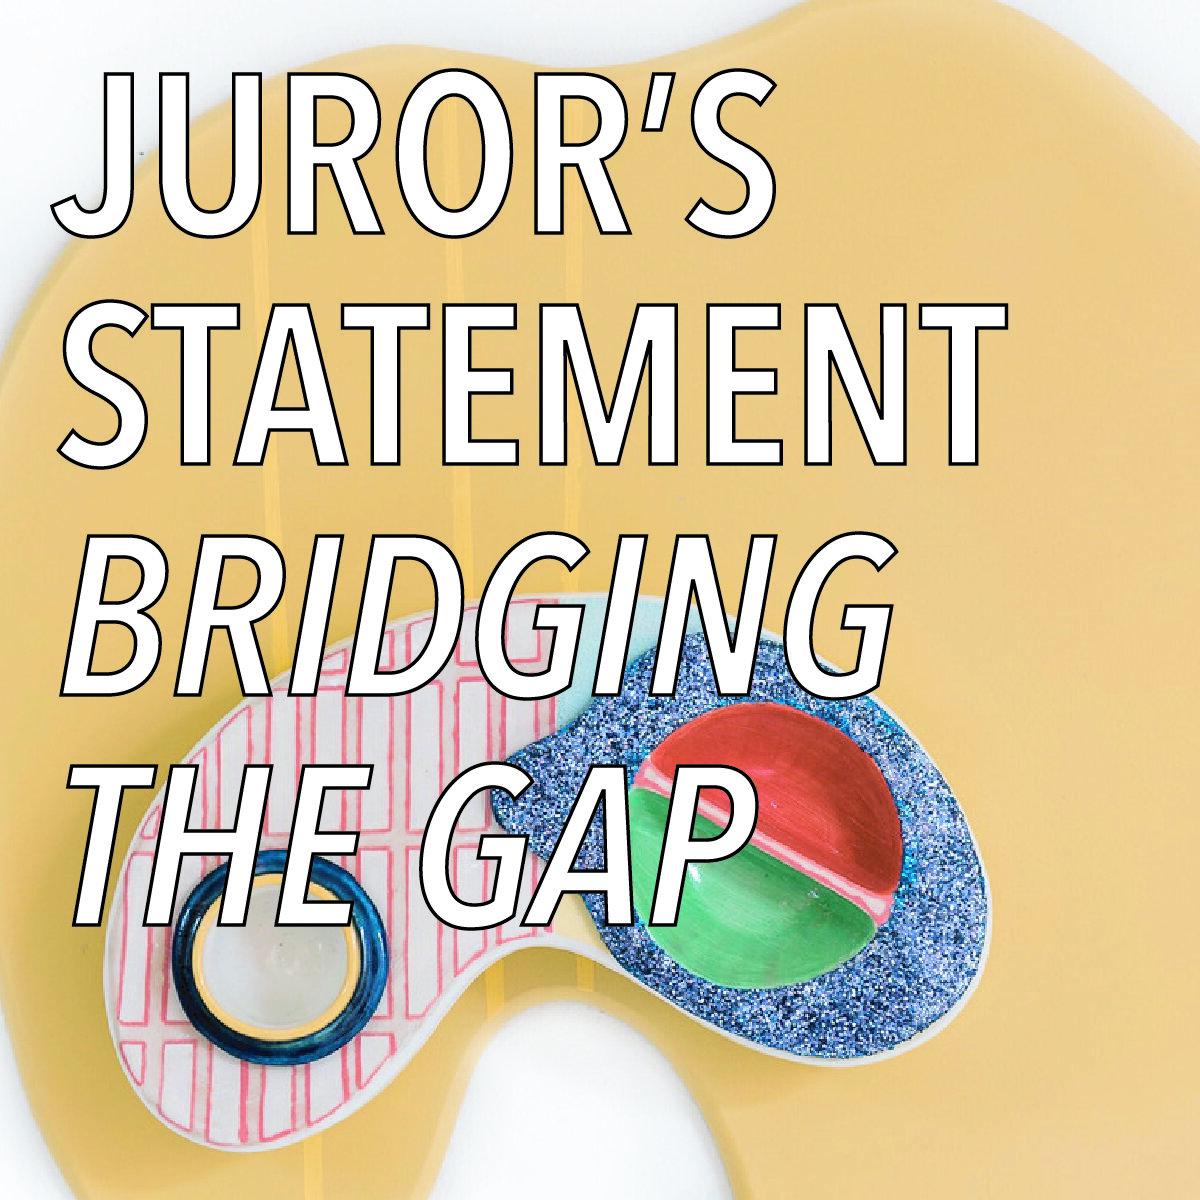 Jurors statement bridging the gap thumb.jpg